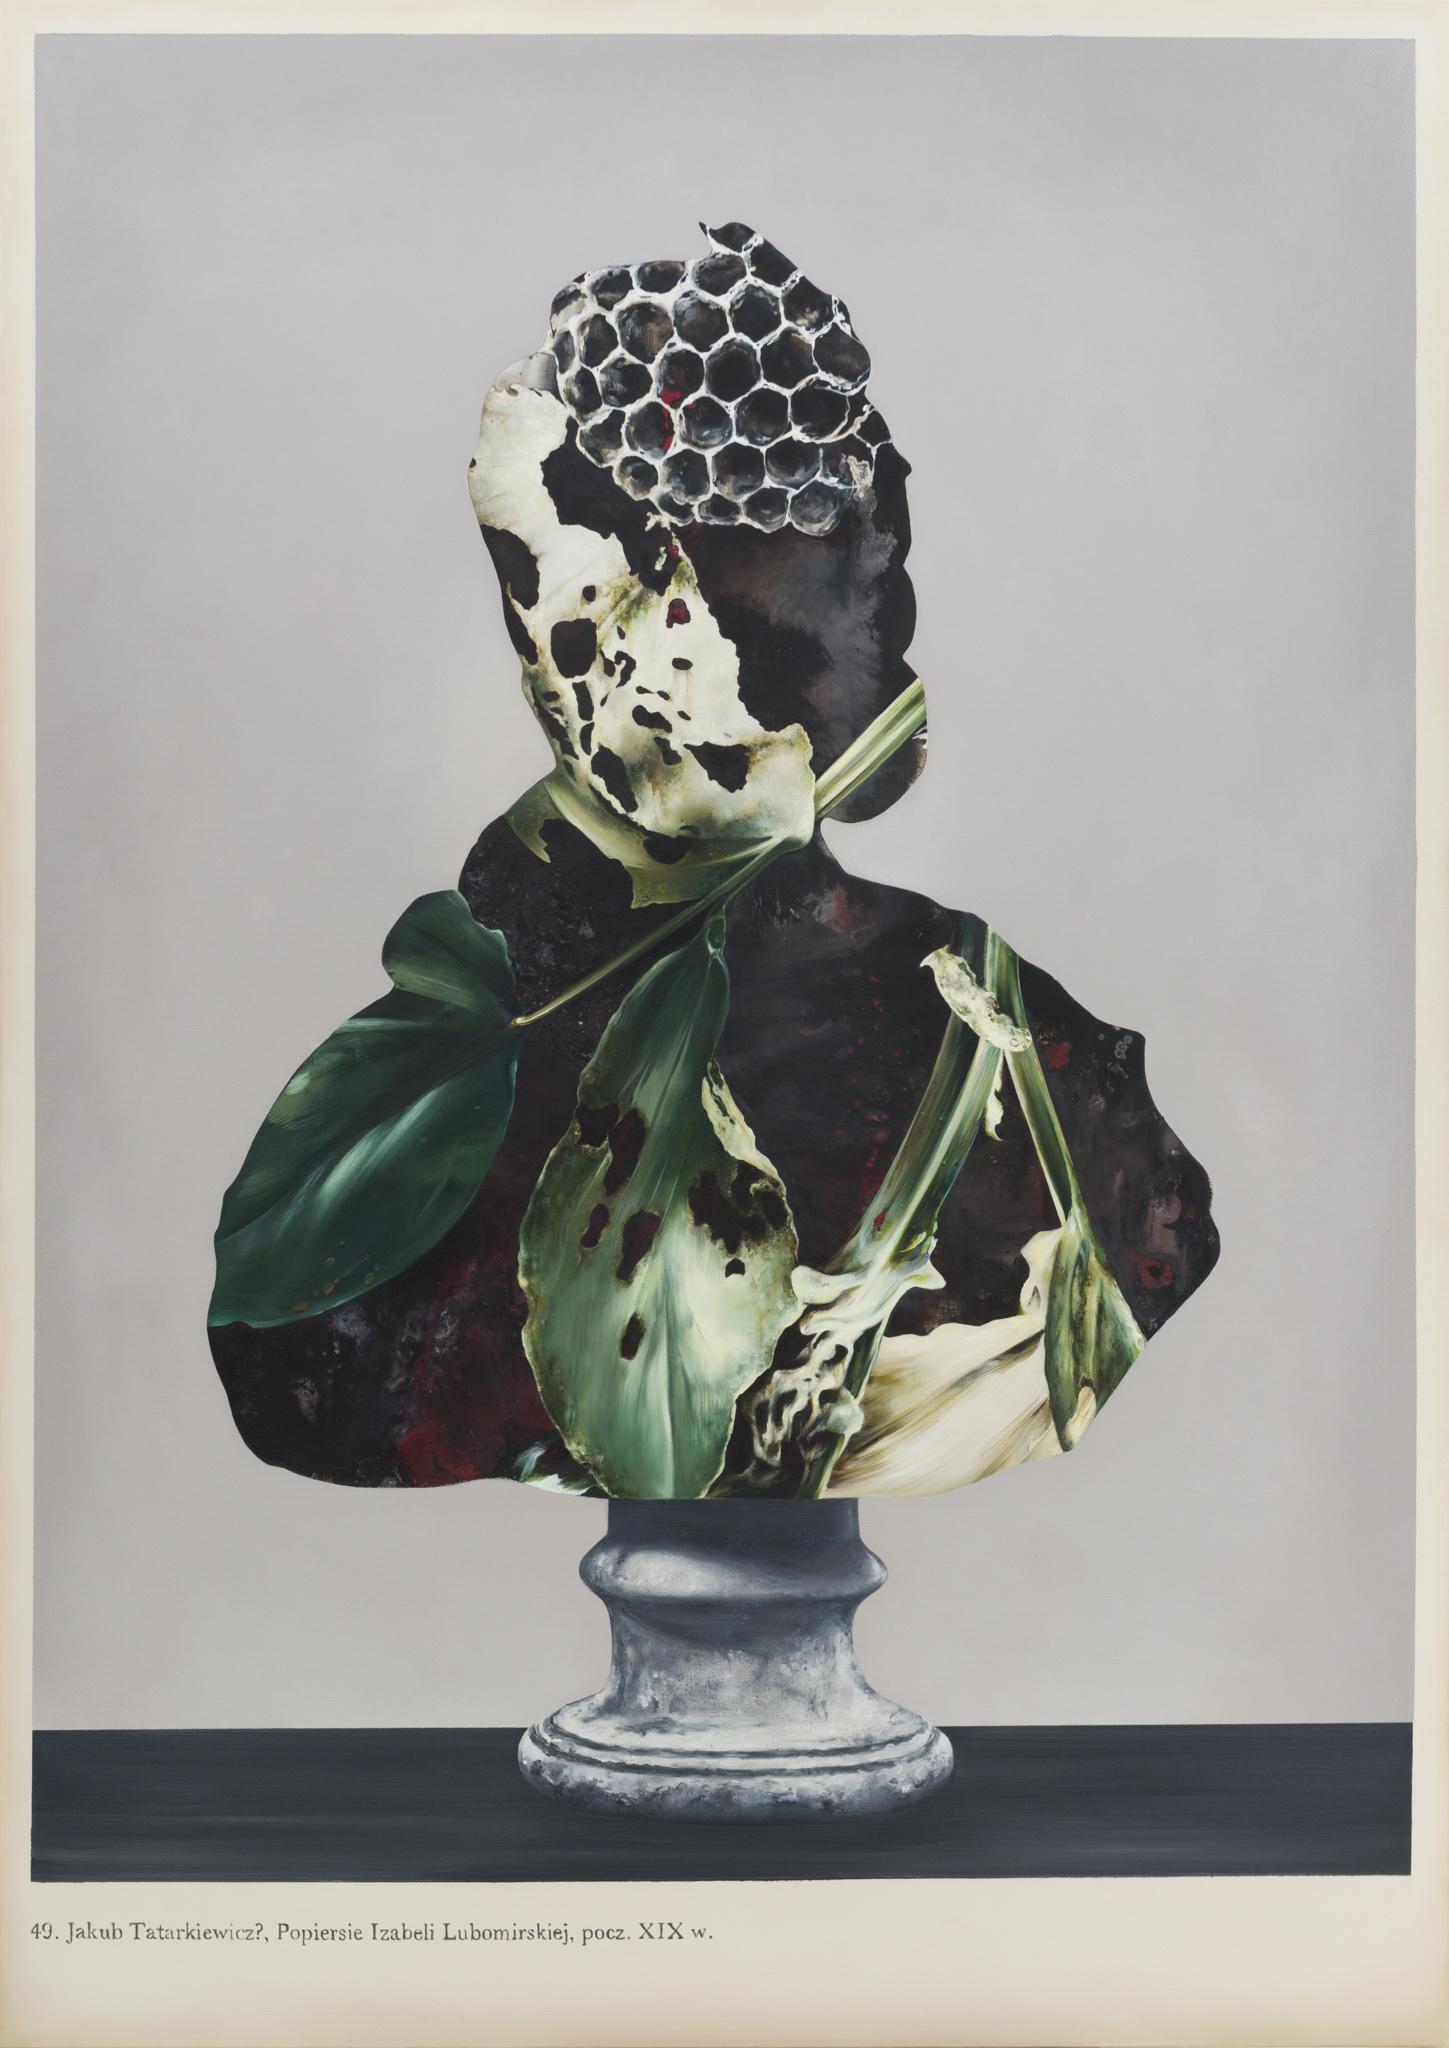 Untitled '49 (2017) - Ewa Juszkiewicz